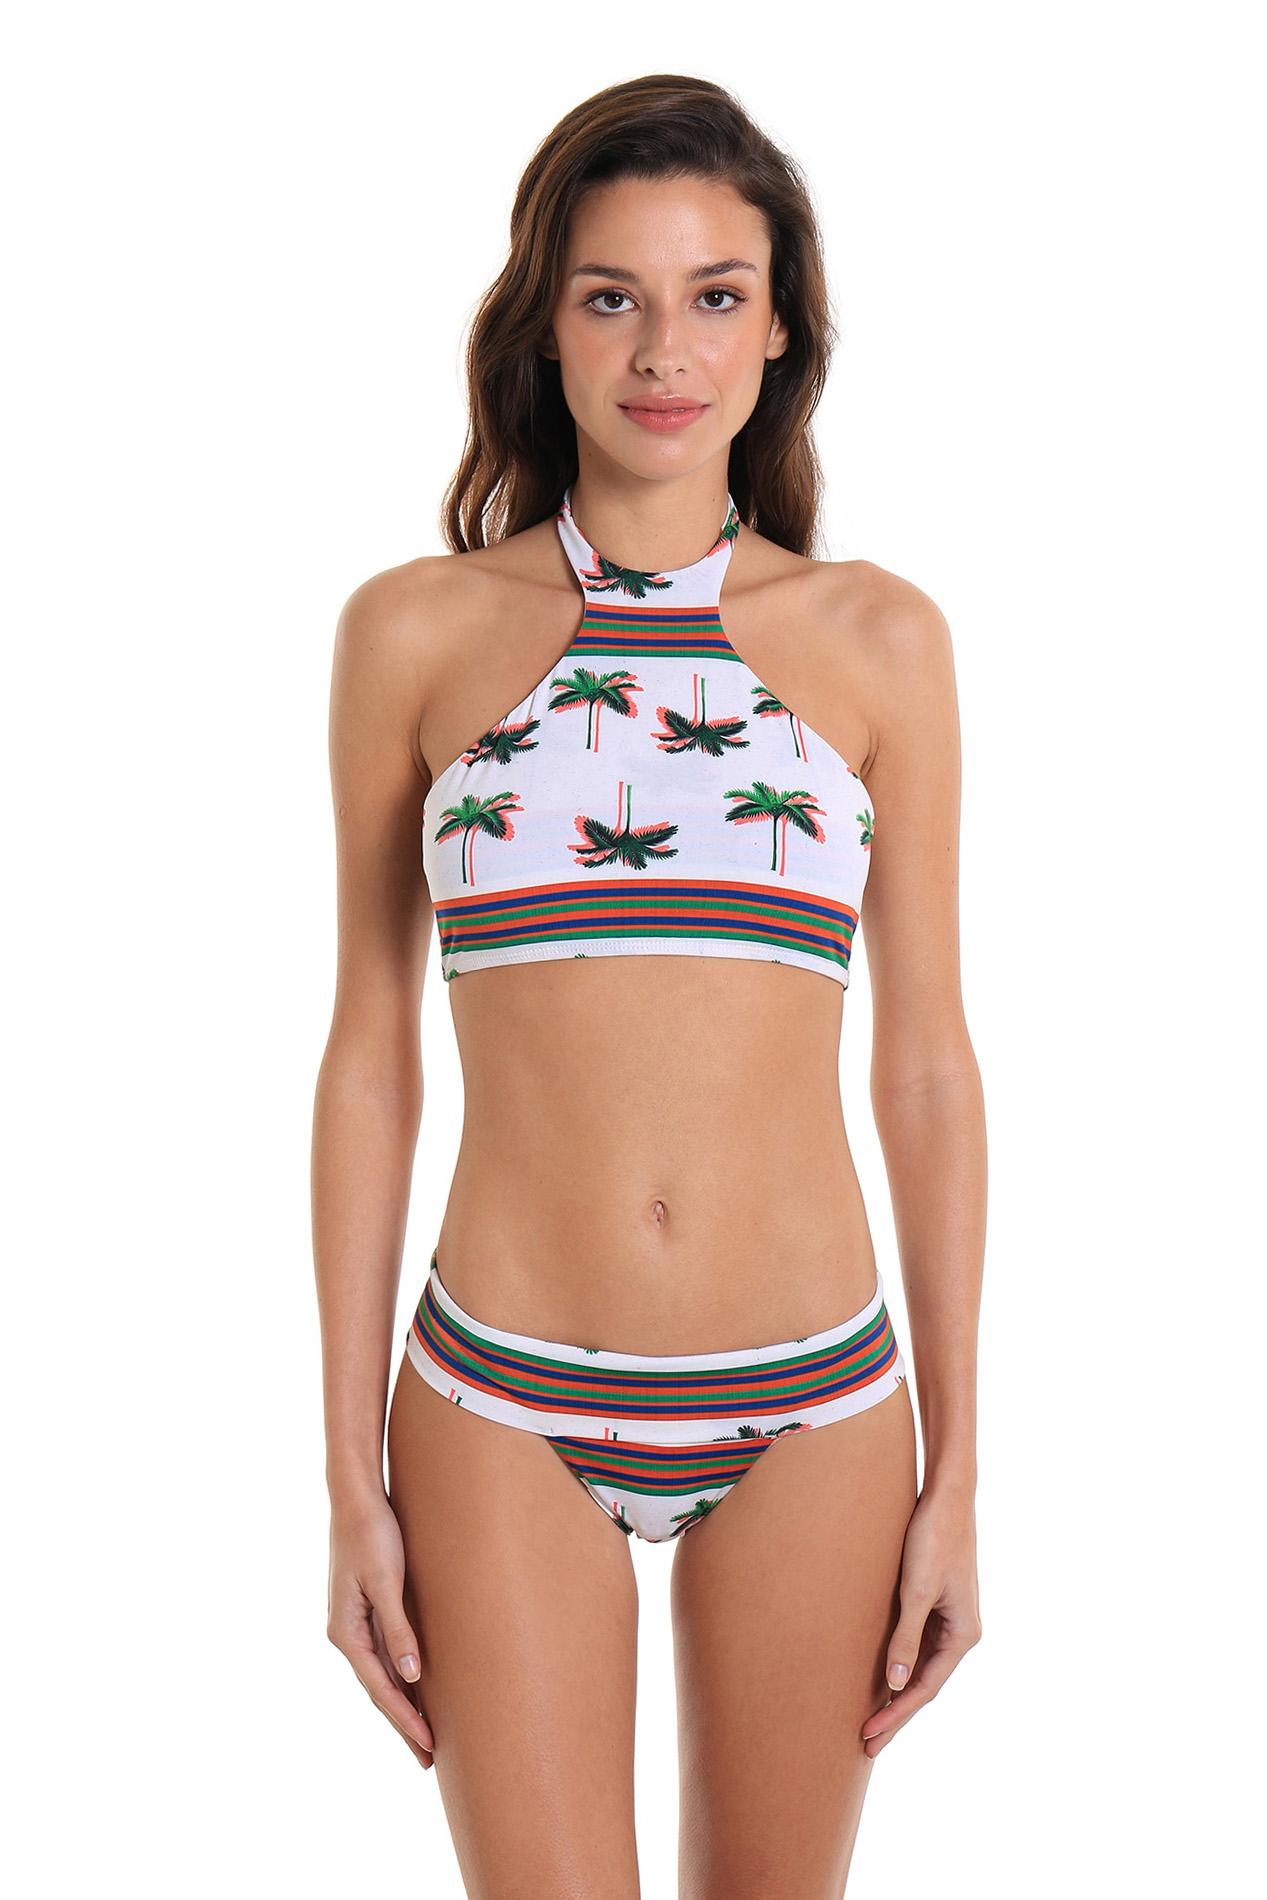 Copacabana Bottoms Bikini Bottoms Copacabana Copacabana Bikini vN0Onwm8